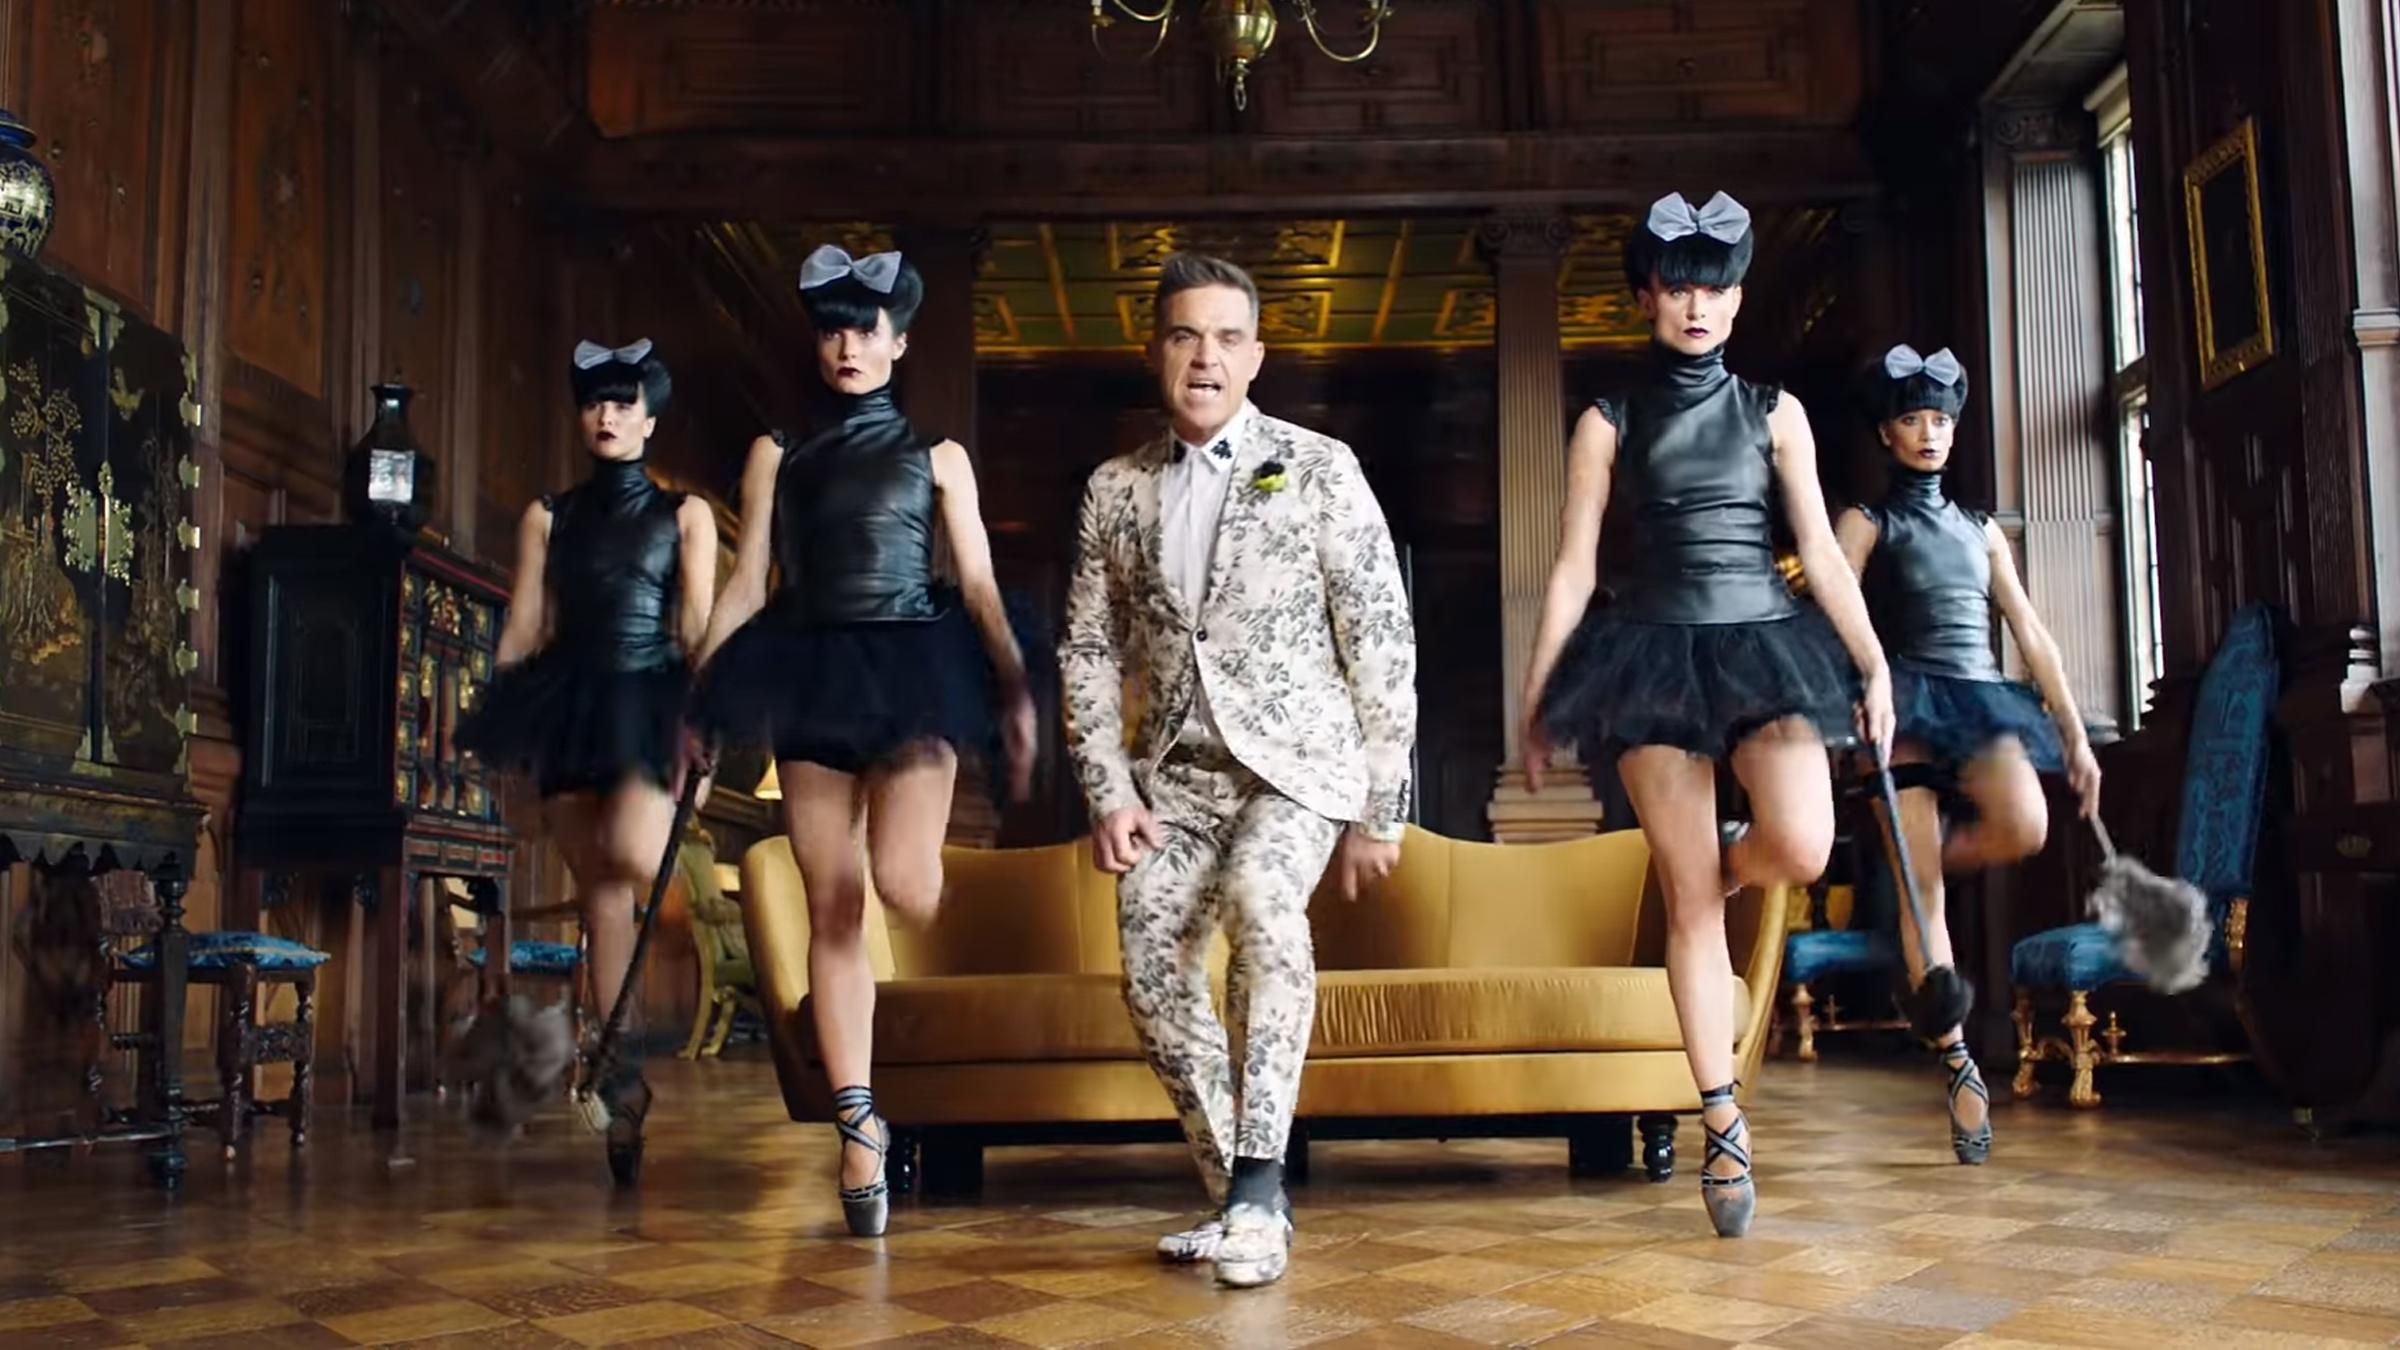 Robbie rusland teaser